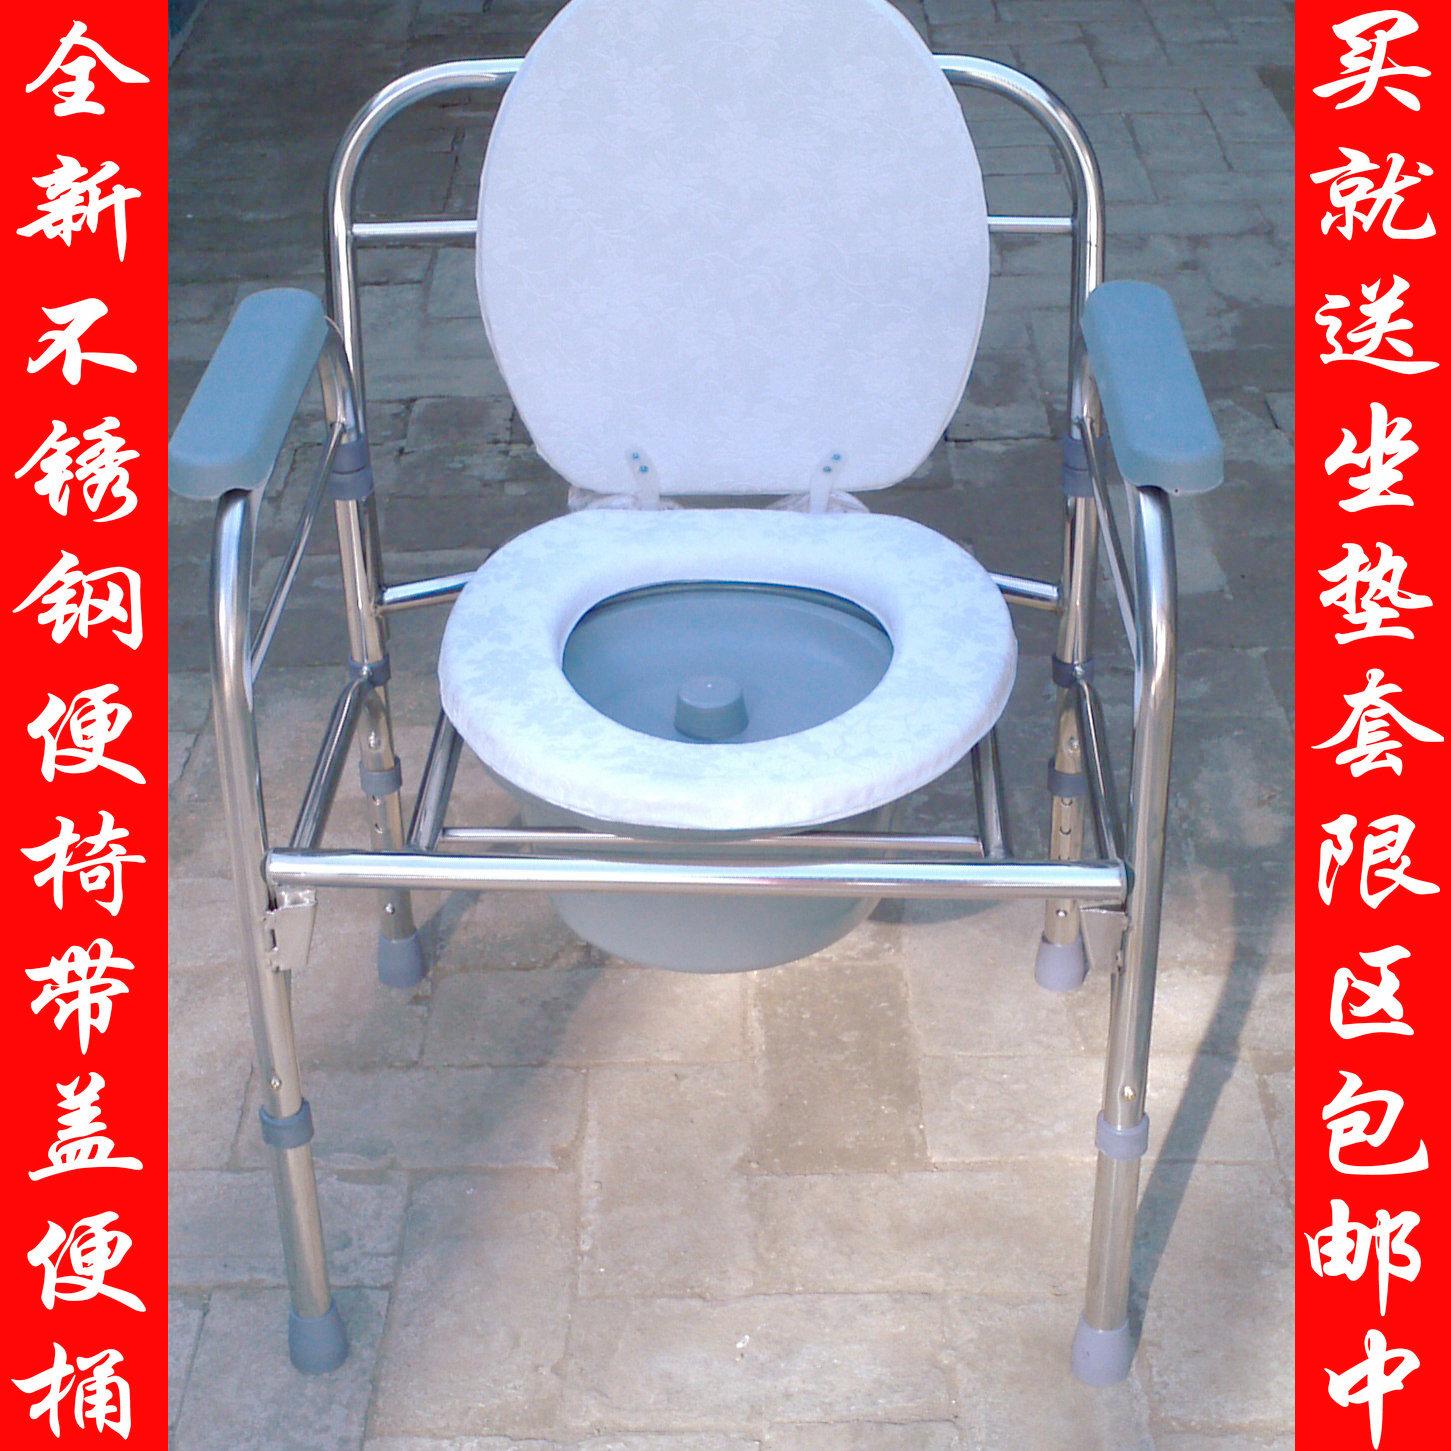 Стул-туалет Aidu